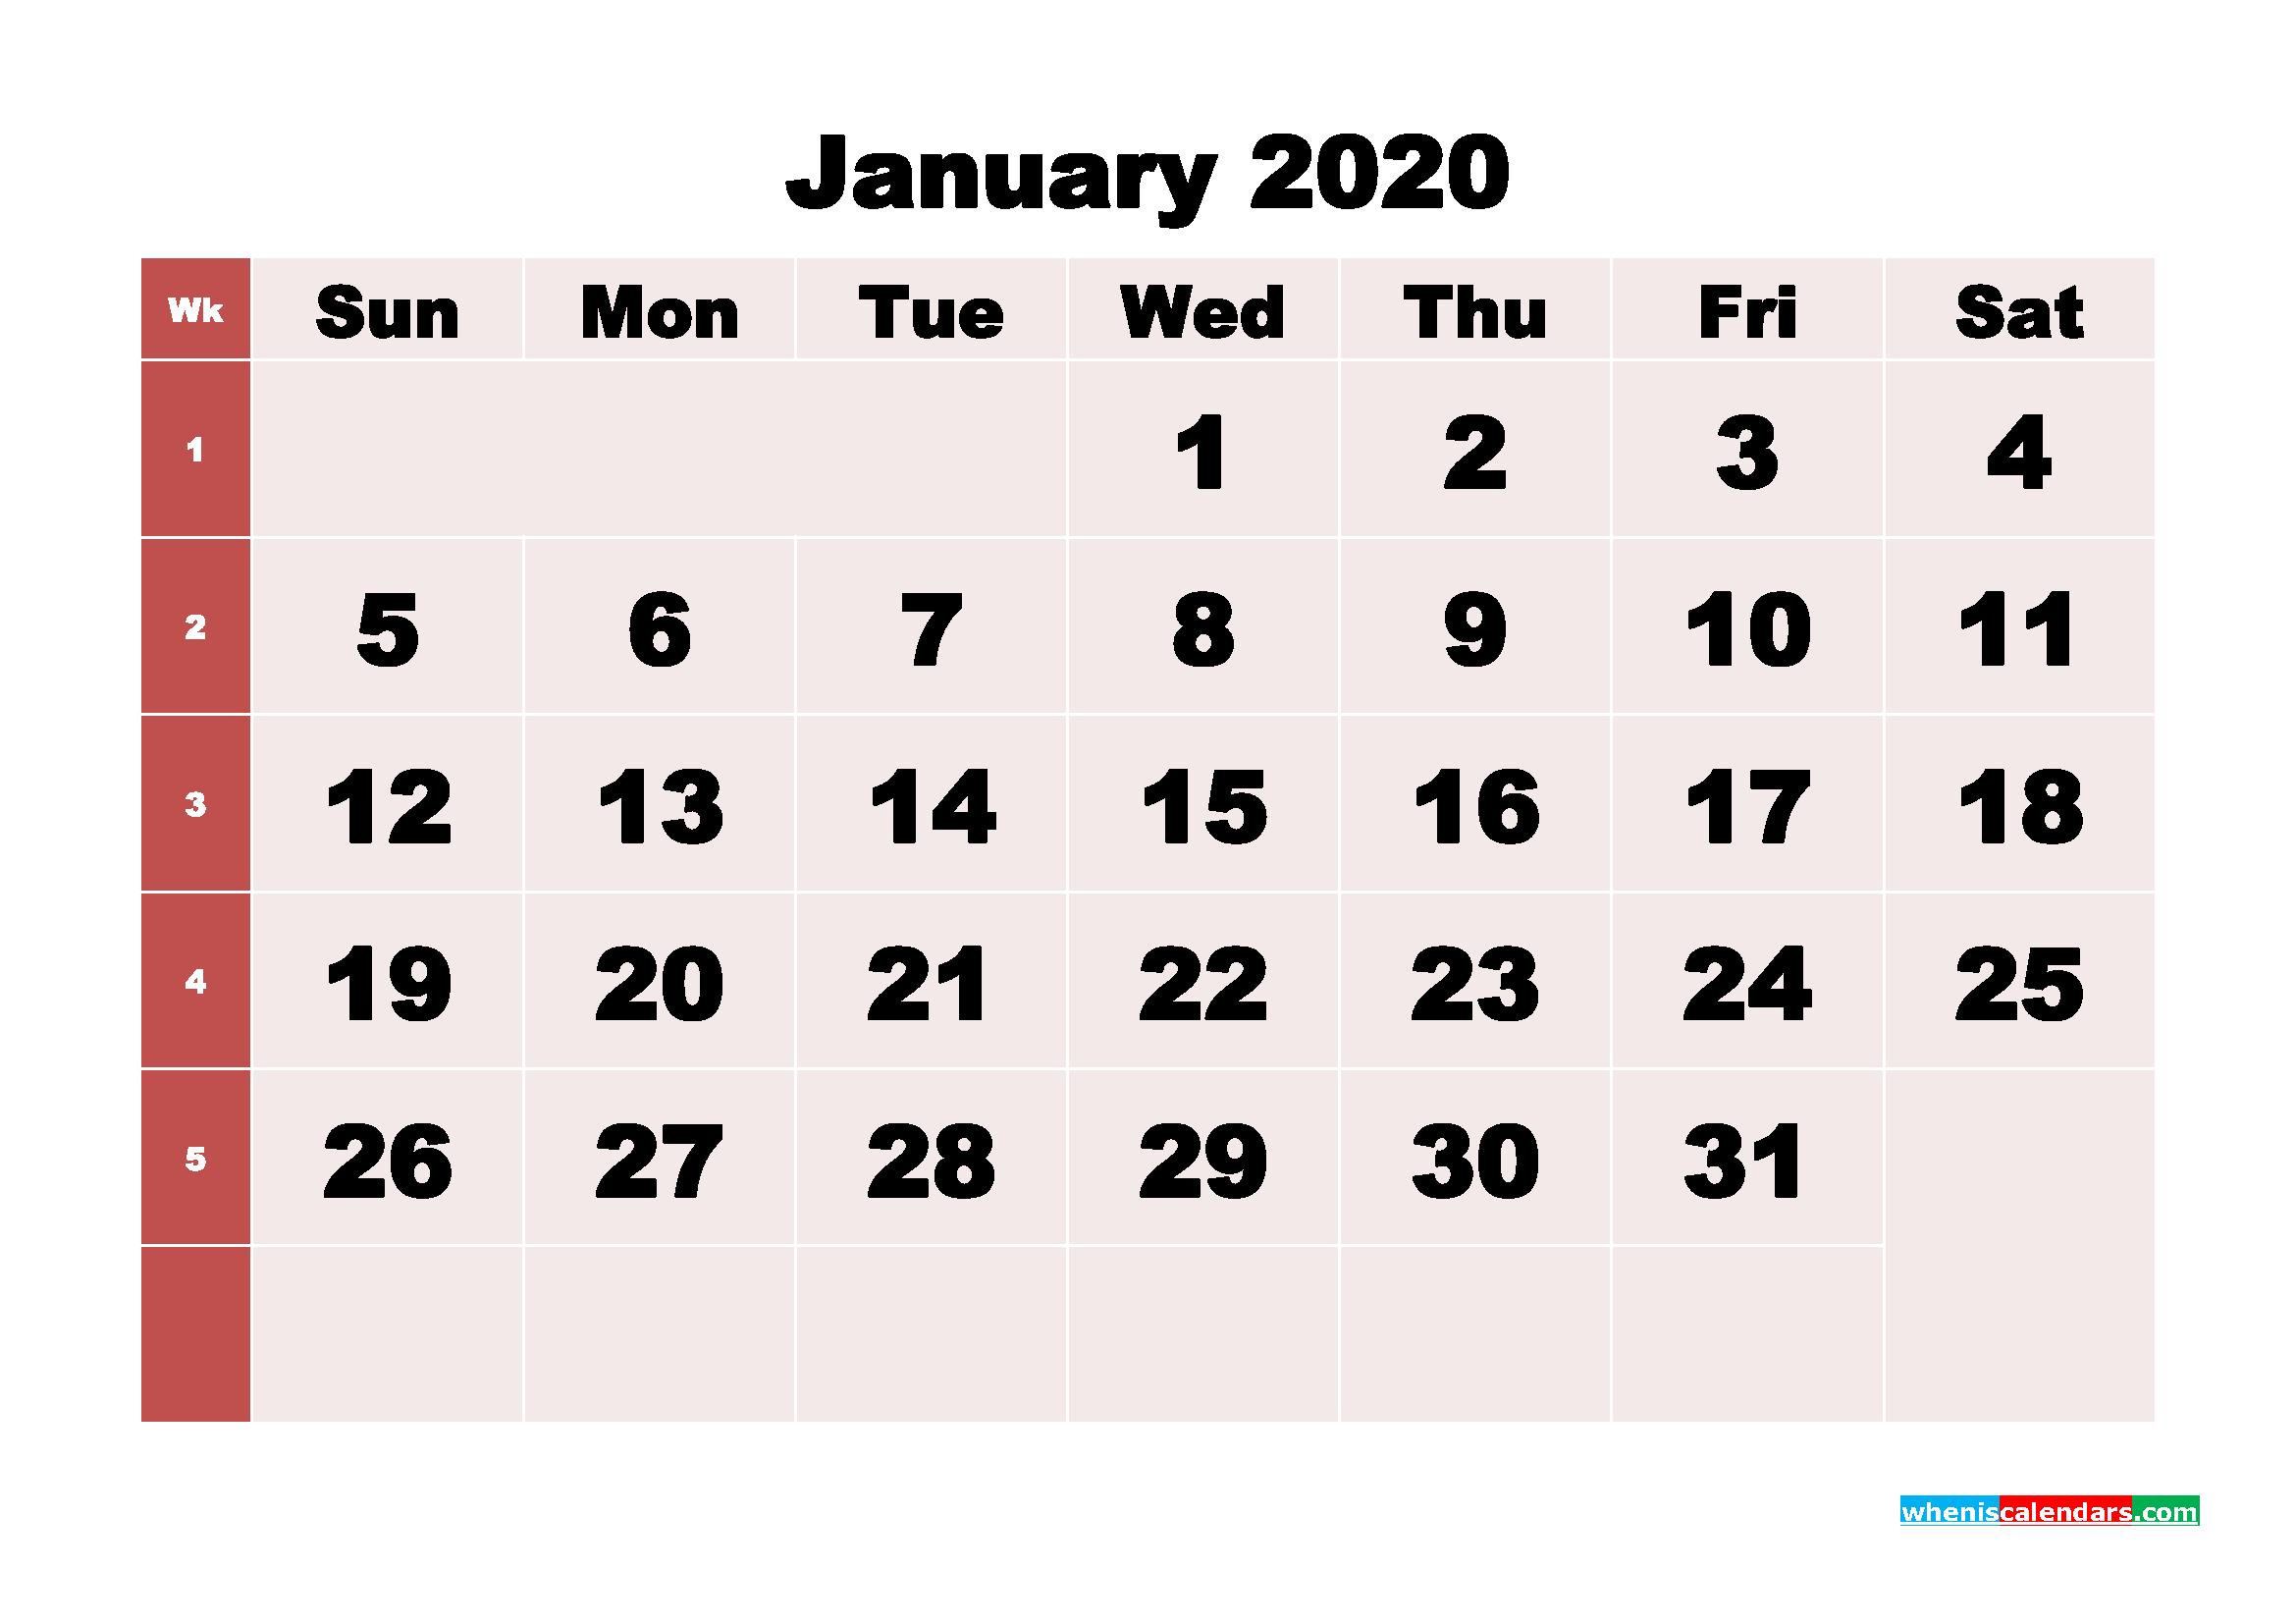 Free Printable January 2020 Calendar - No.m20b241